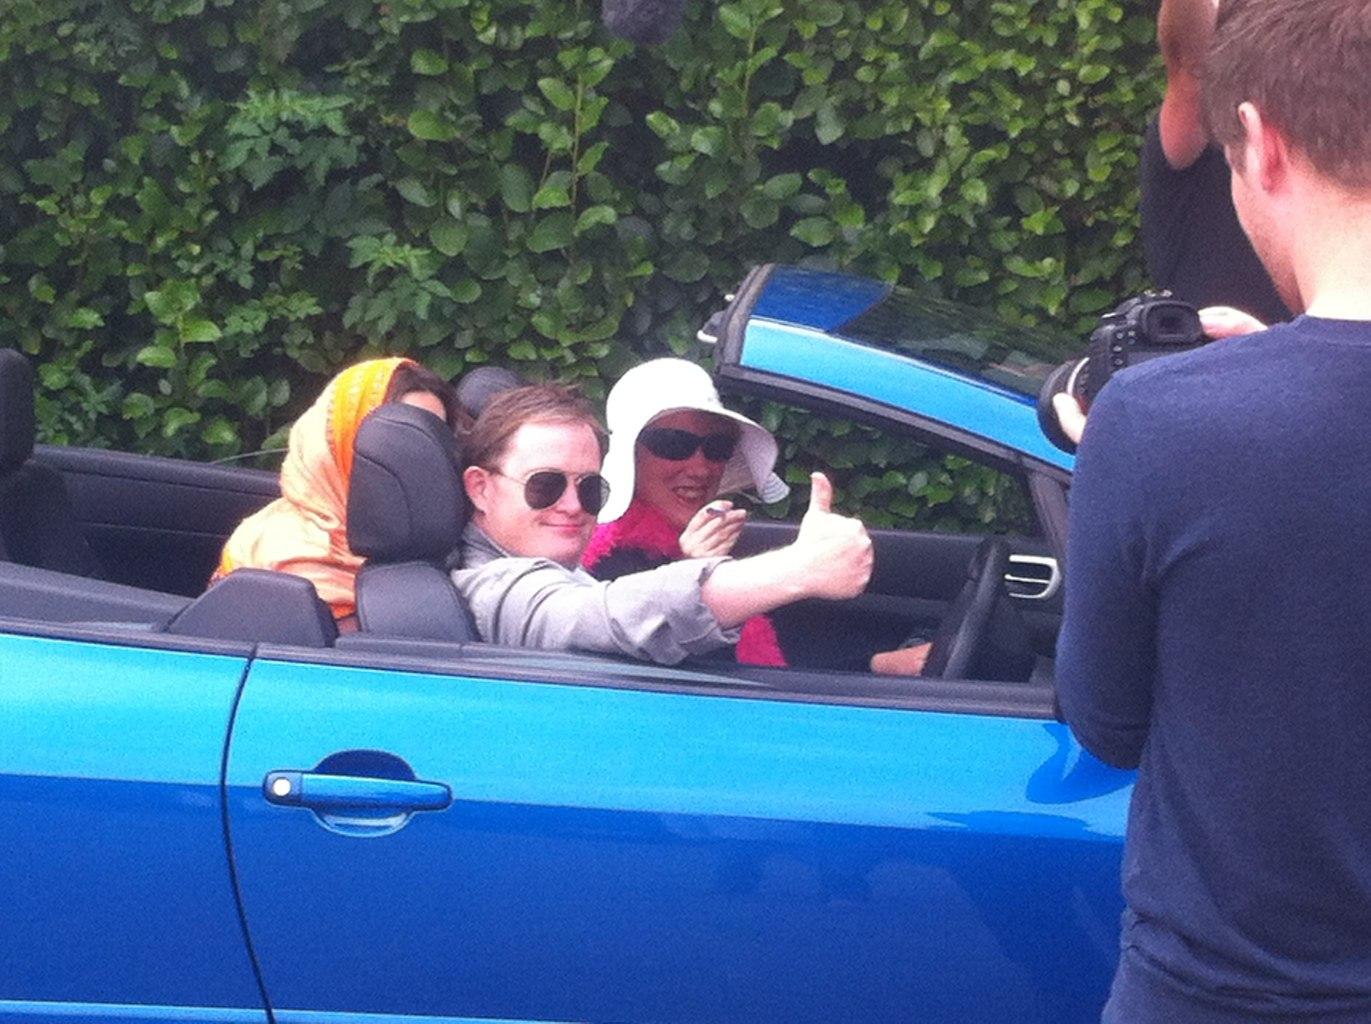 Edward as James Bond filming